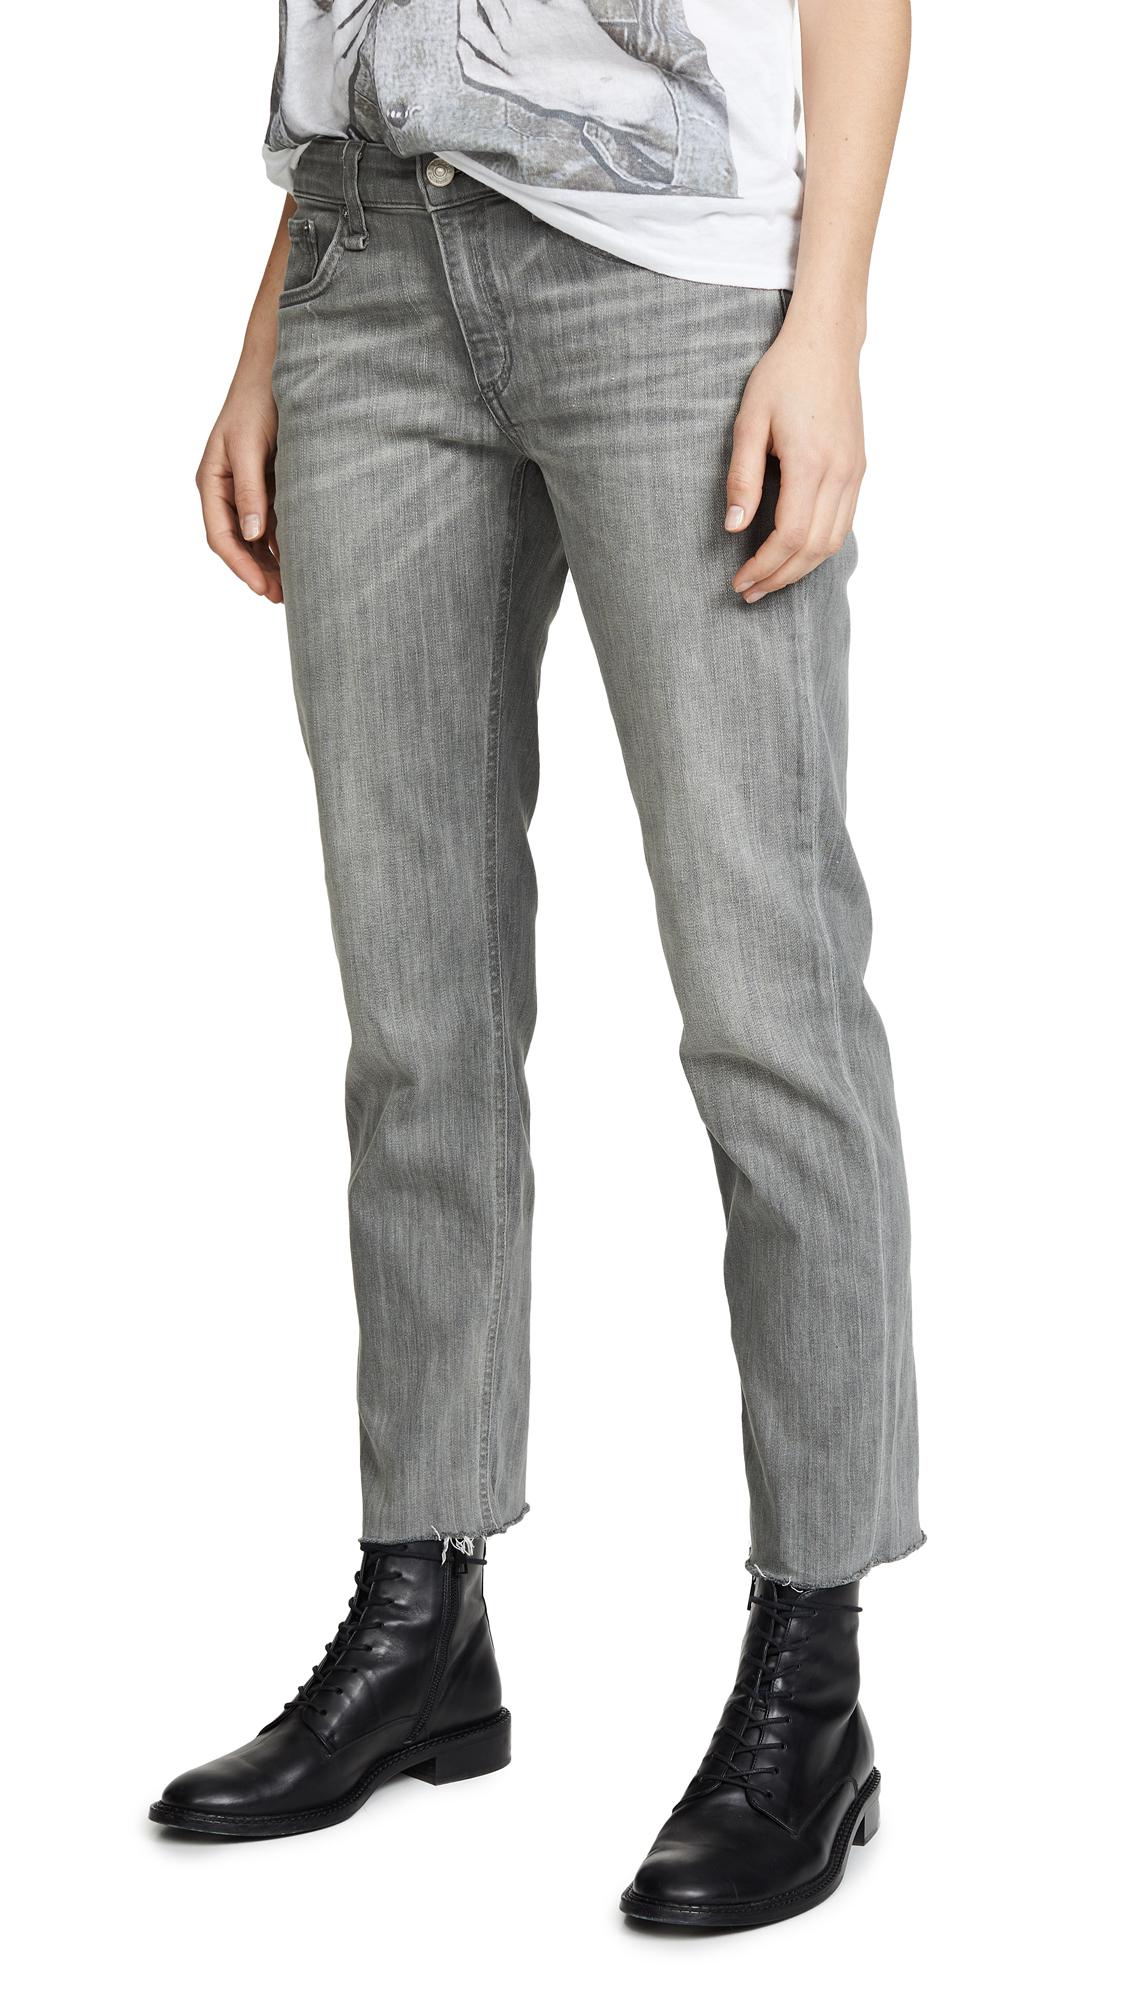 Rag & Bone/JEAN Ankle Dre Jeans - Byland